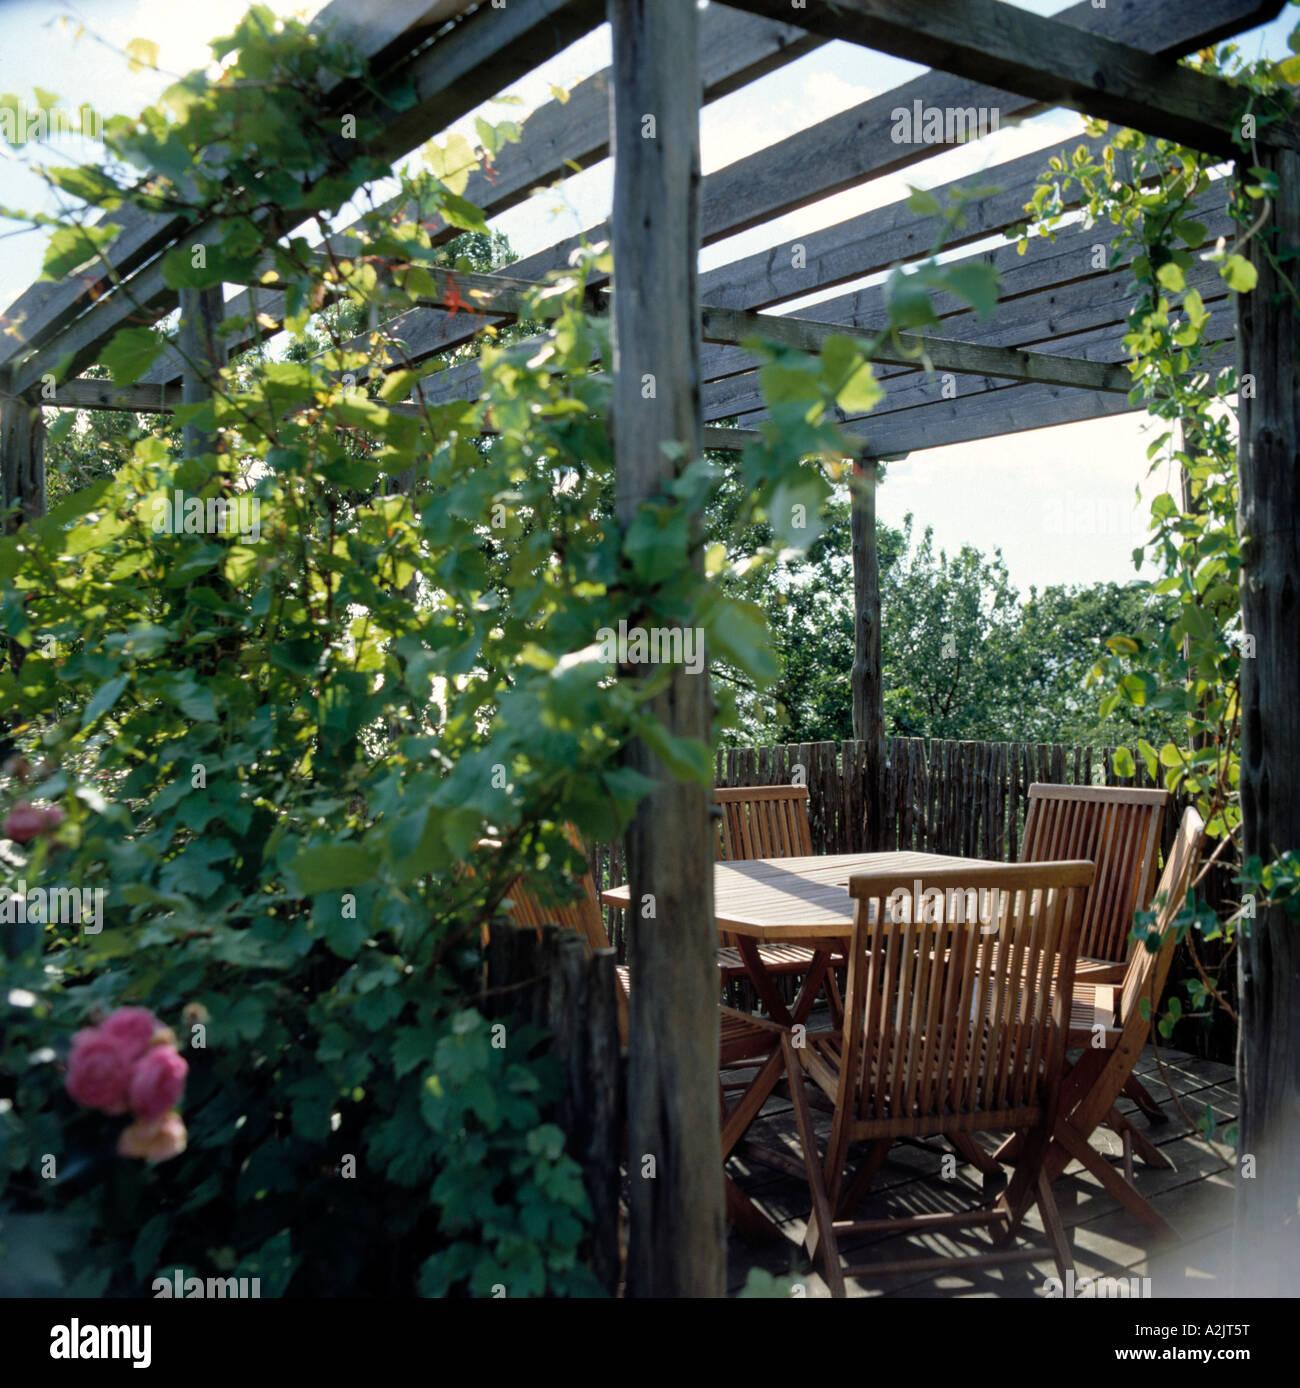 Rose pergolas stockfotos rose pergolas bilder alamy - Holztisch terrasse ...